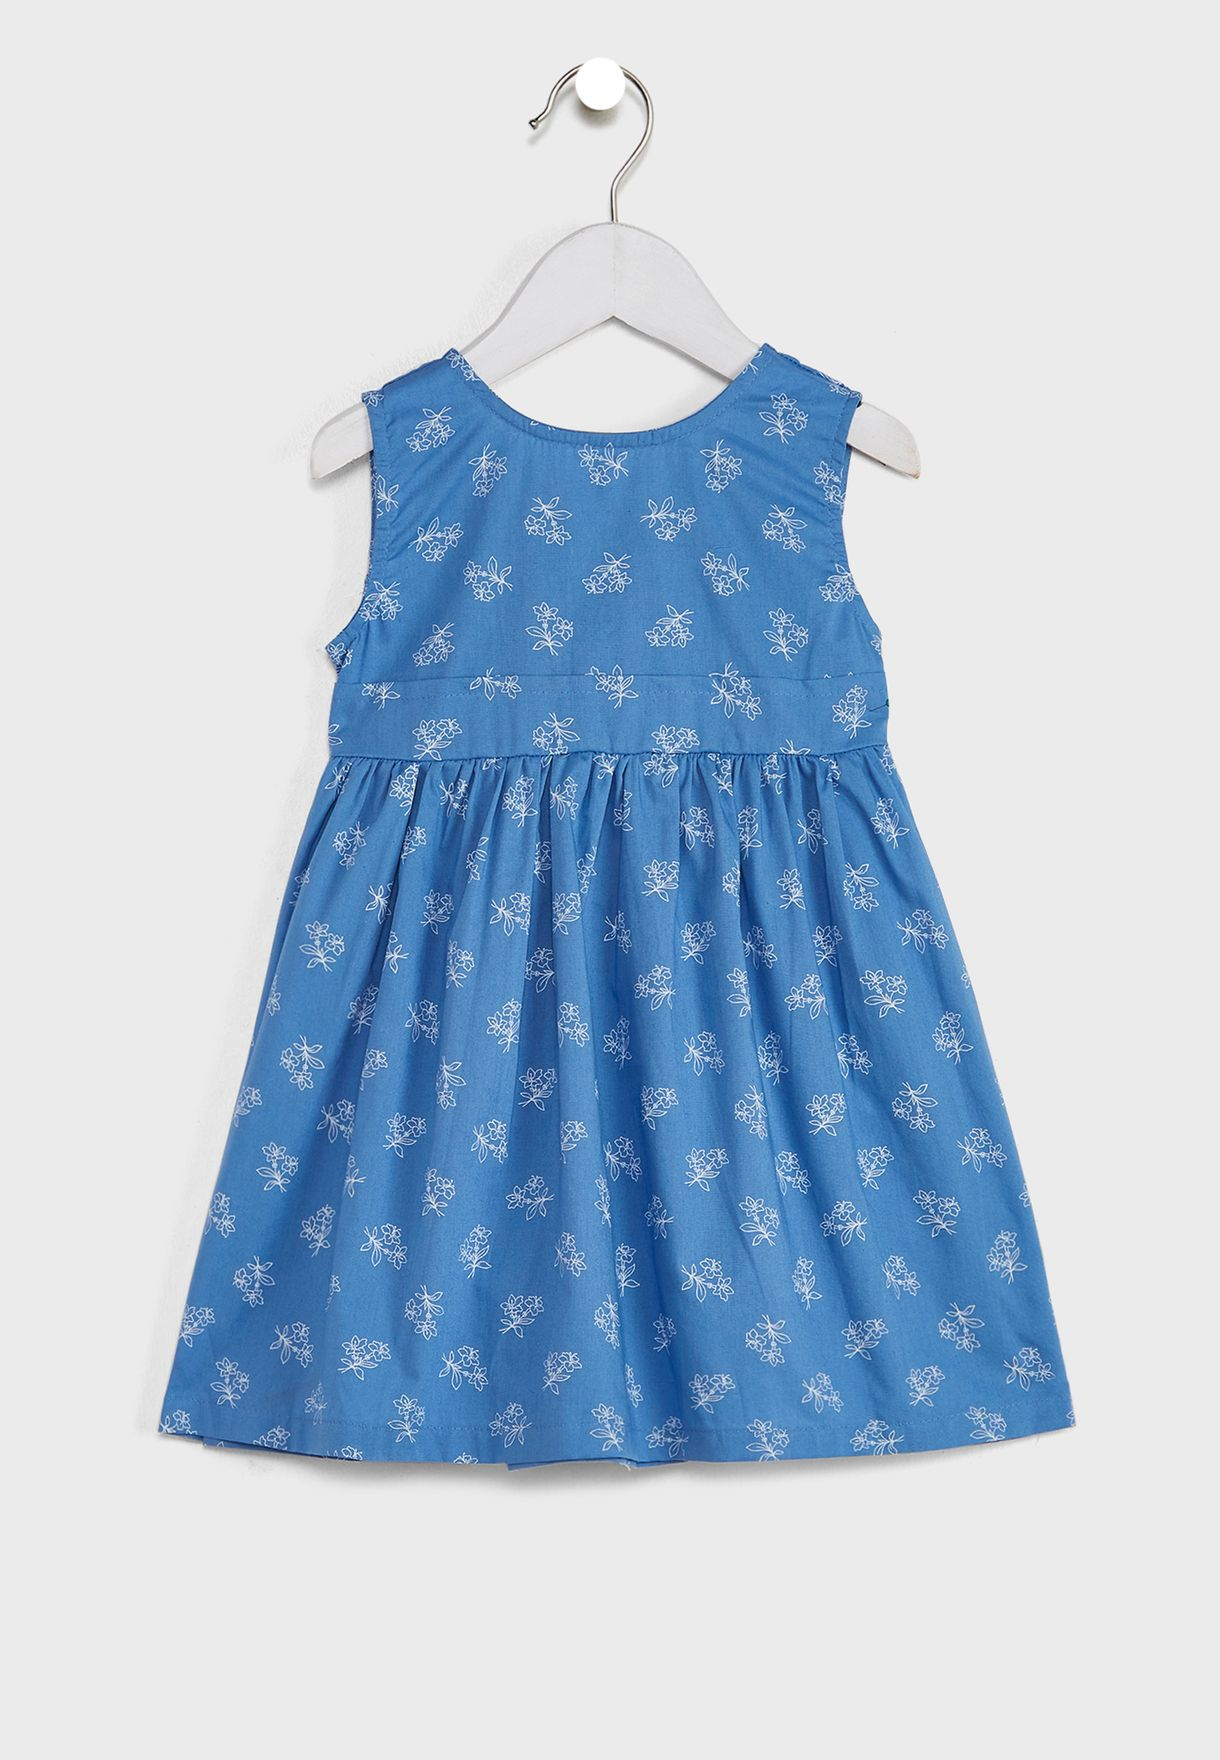 Infant Floral Print Dress